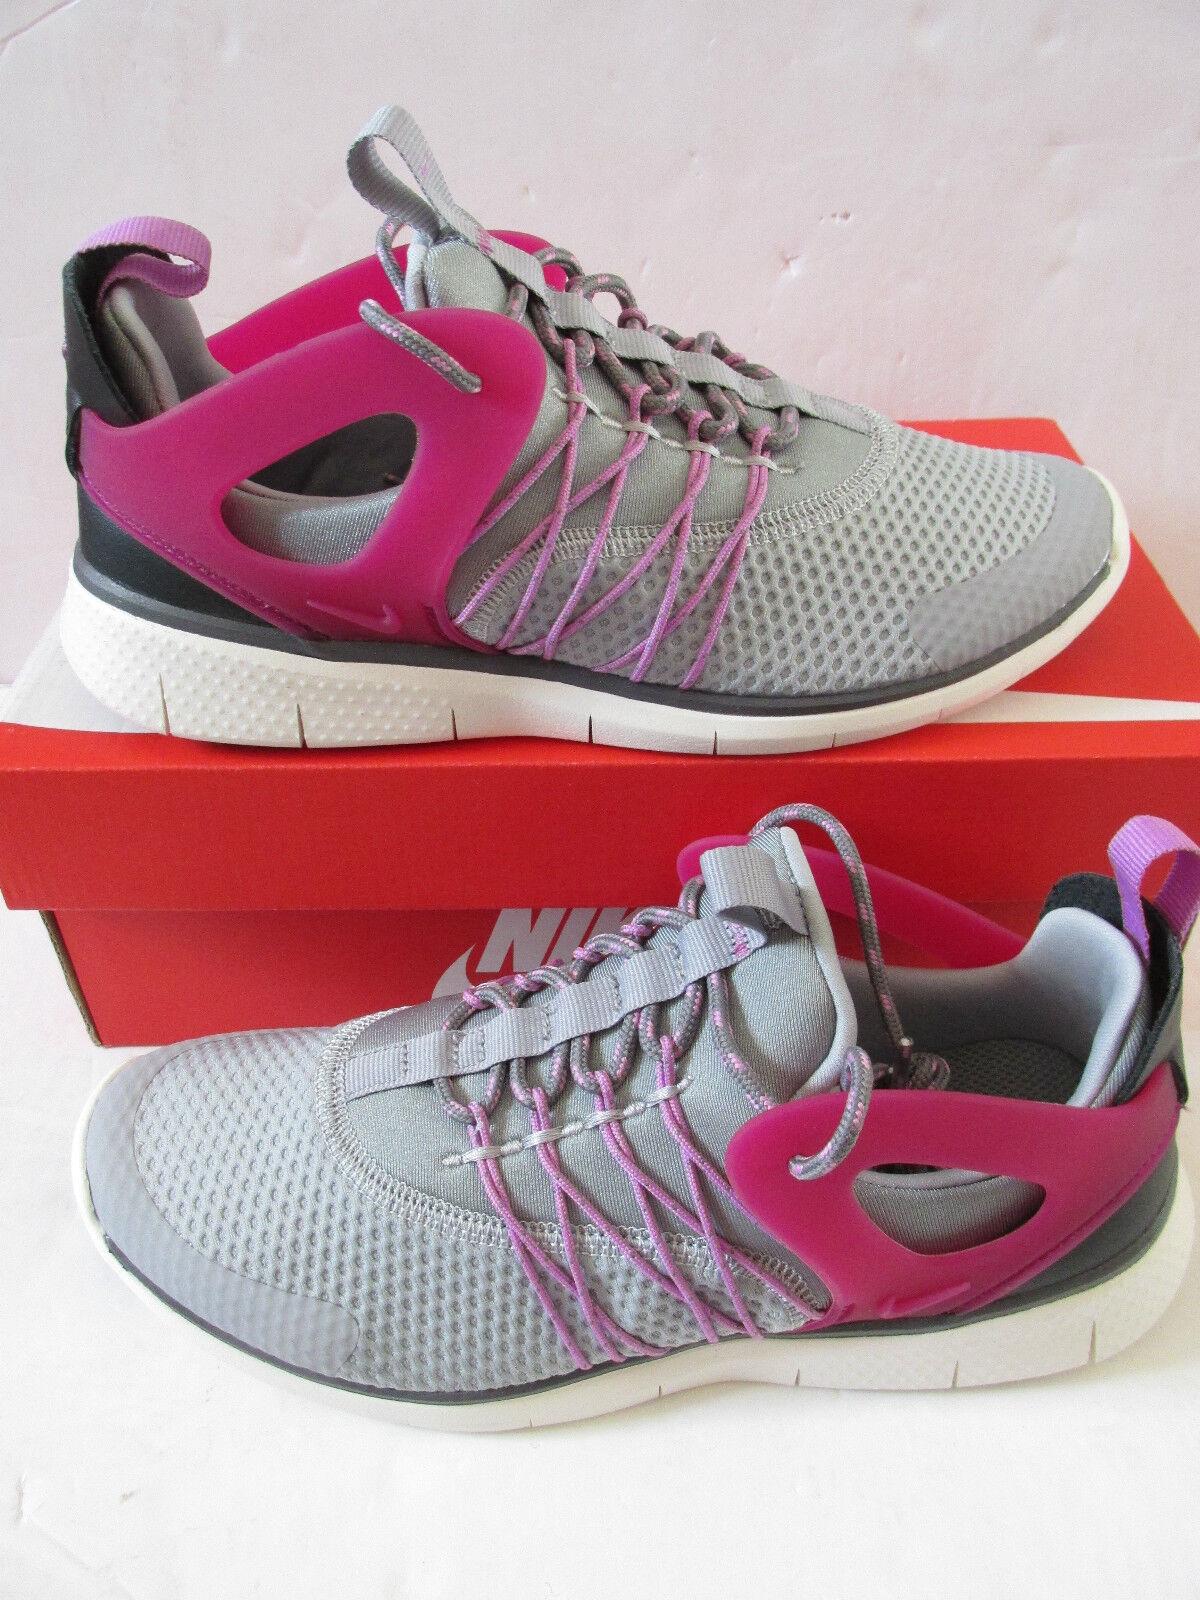 Nike free free free Viritous  s running trainers 725060 002 baskets chaussures | Online Store  300b98